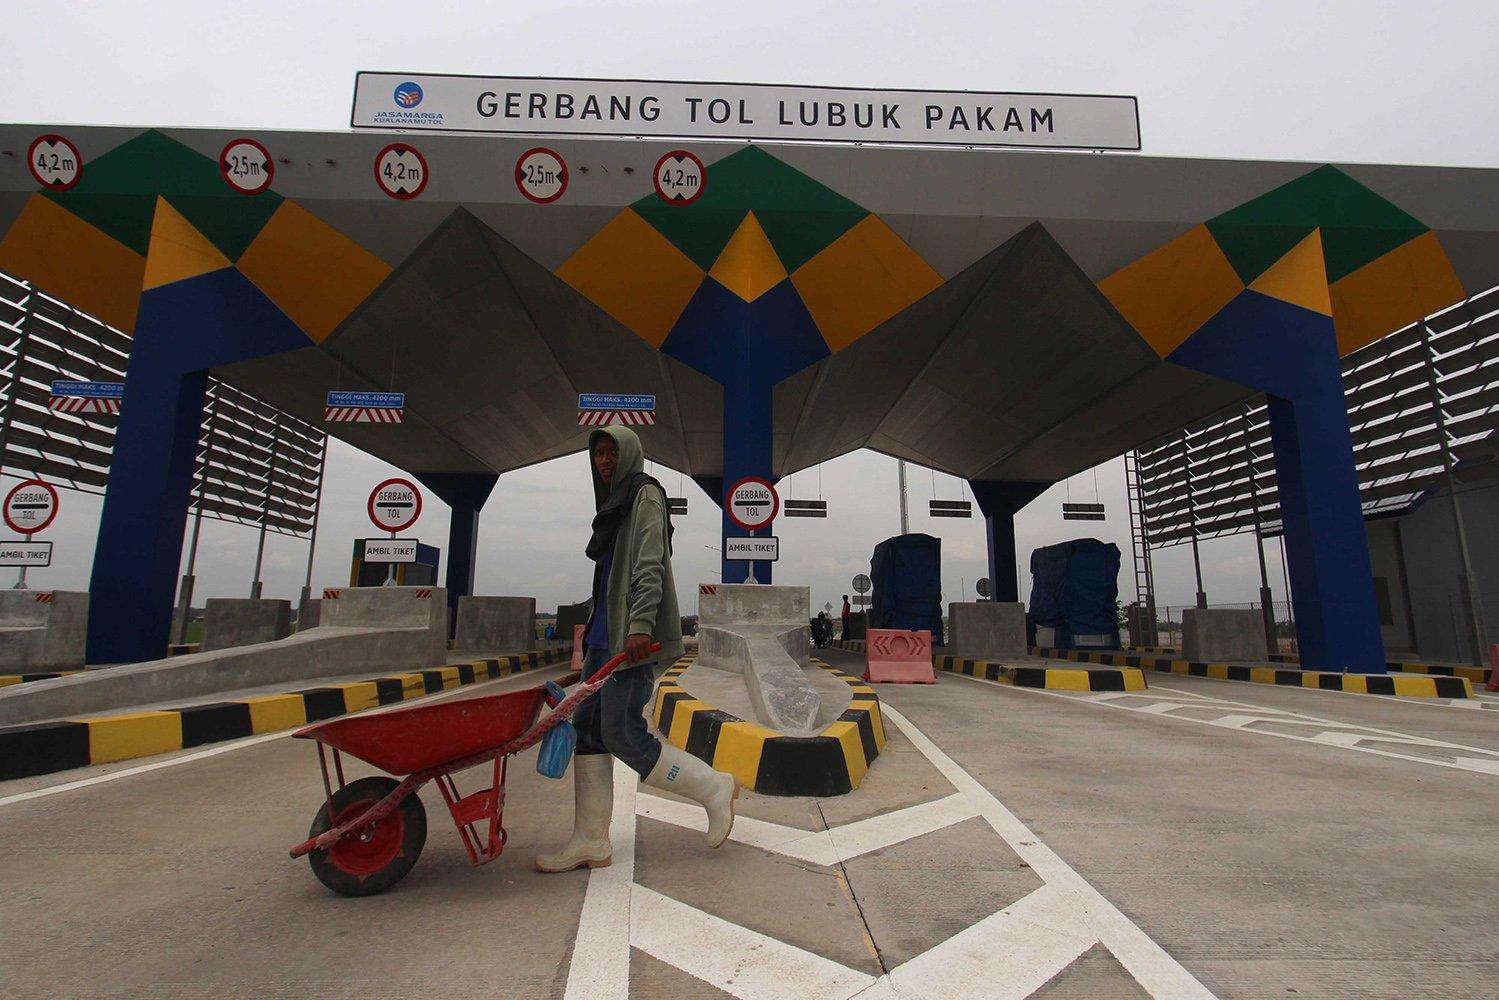 Gerbang tol ruas Lubuk Pakam-Medan-Tebing Tinggi yang telah selesai di Kabupaten Deli Serdang, Sumatera Utara, Selasa (9/5).